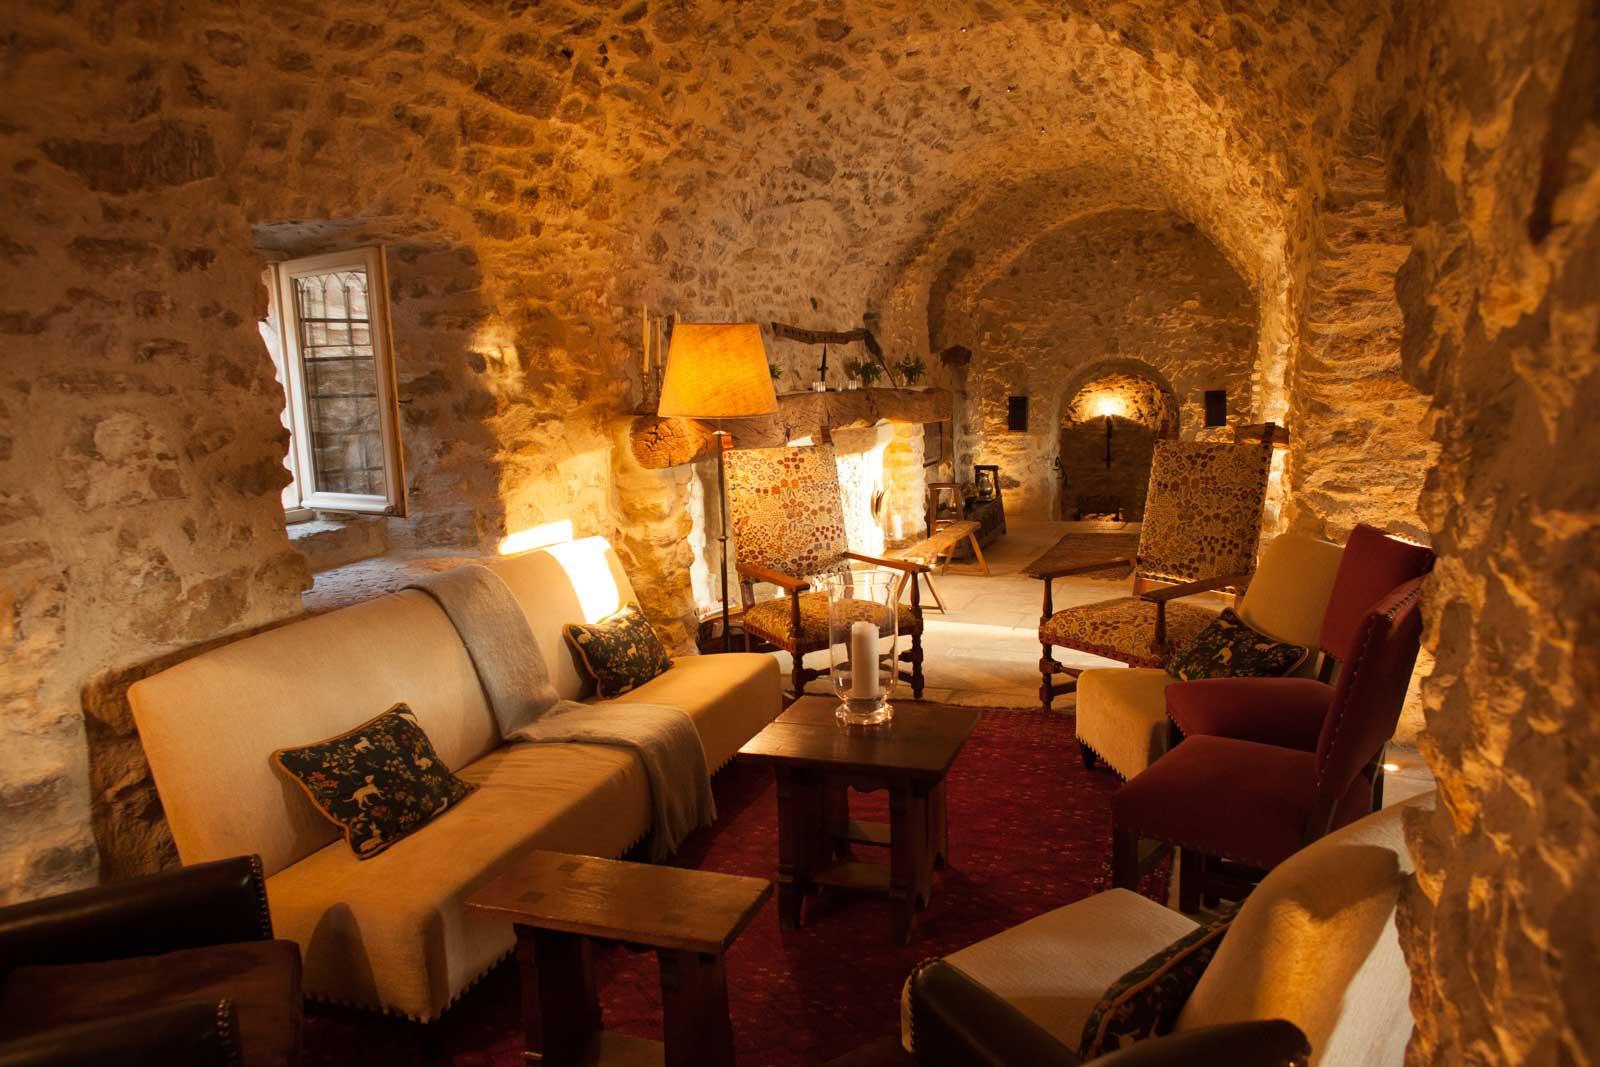 The lounge area inside La Verrière. ©Kevin Day / Opening a Bottle